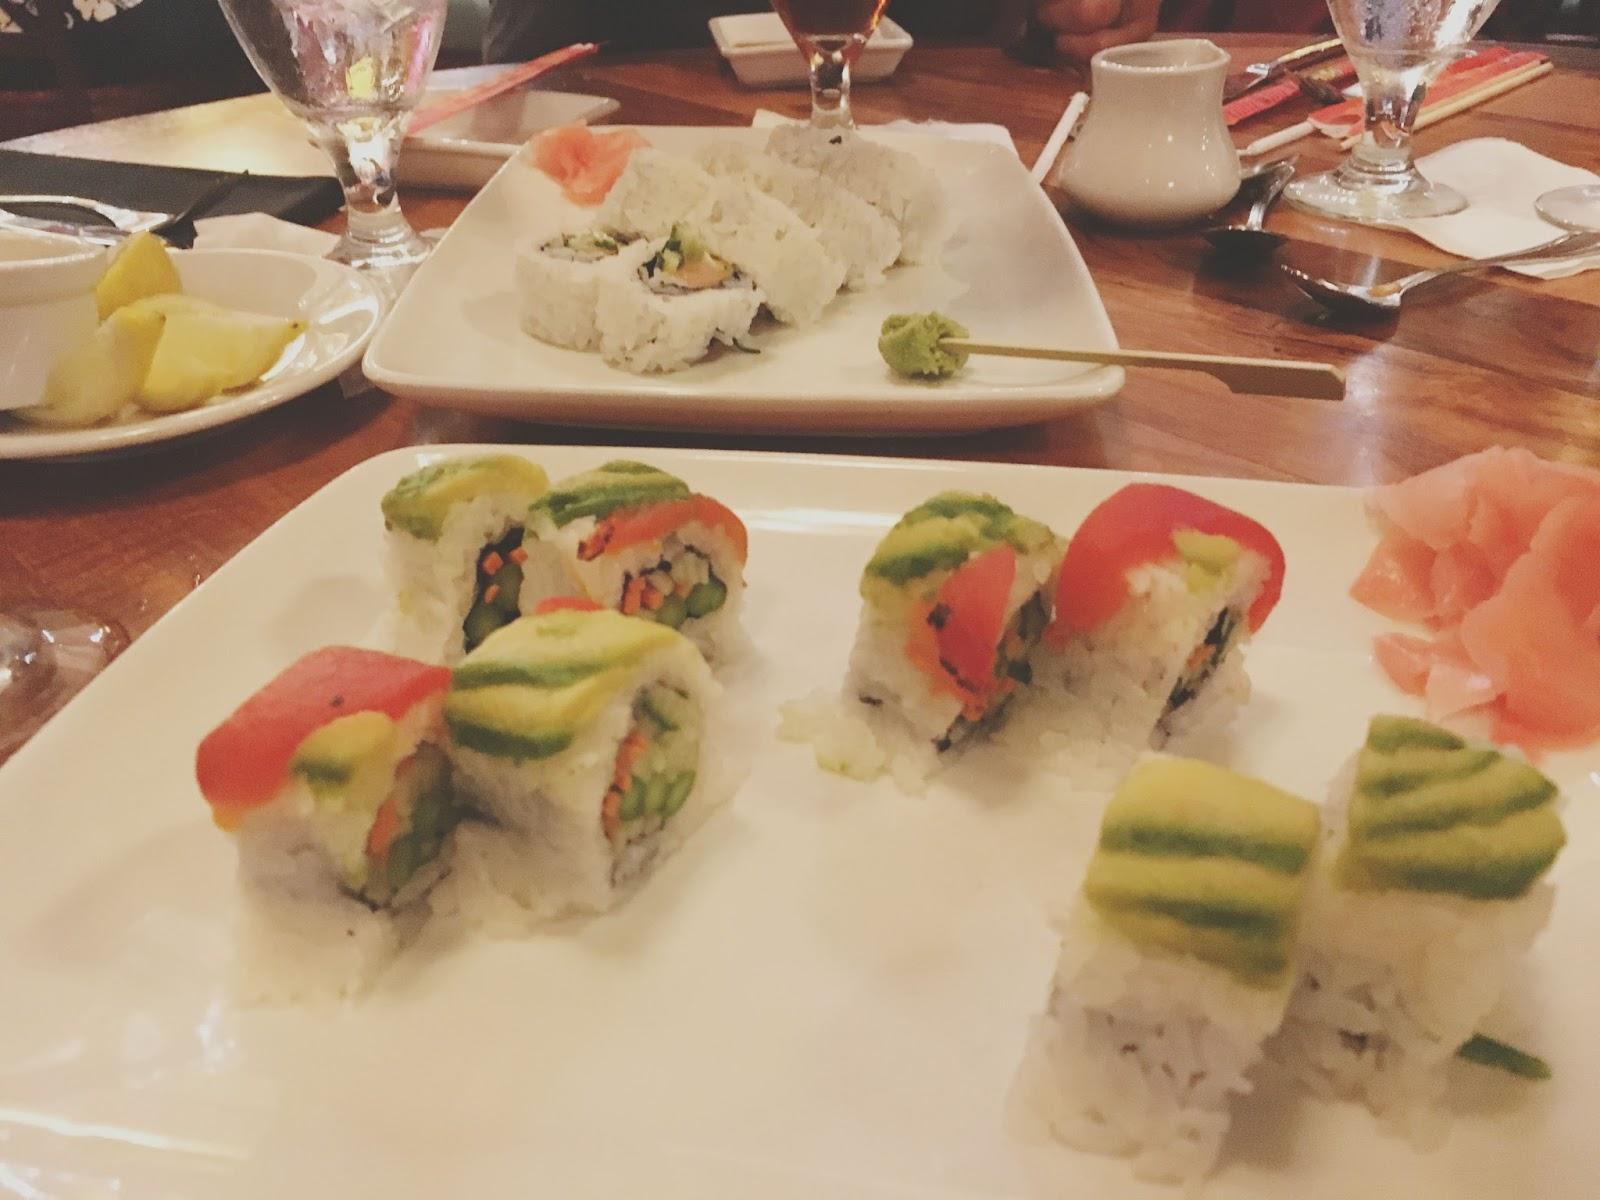 sushi at Kona Cafe in Disney World, Florida